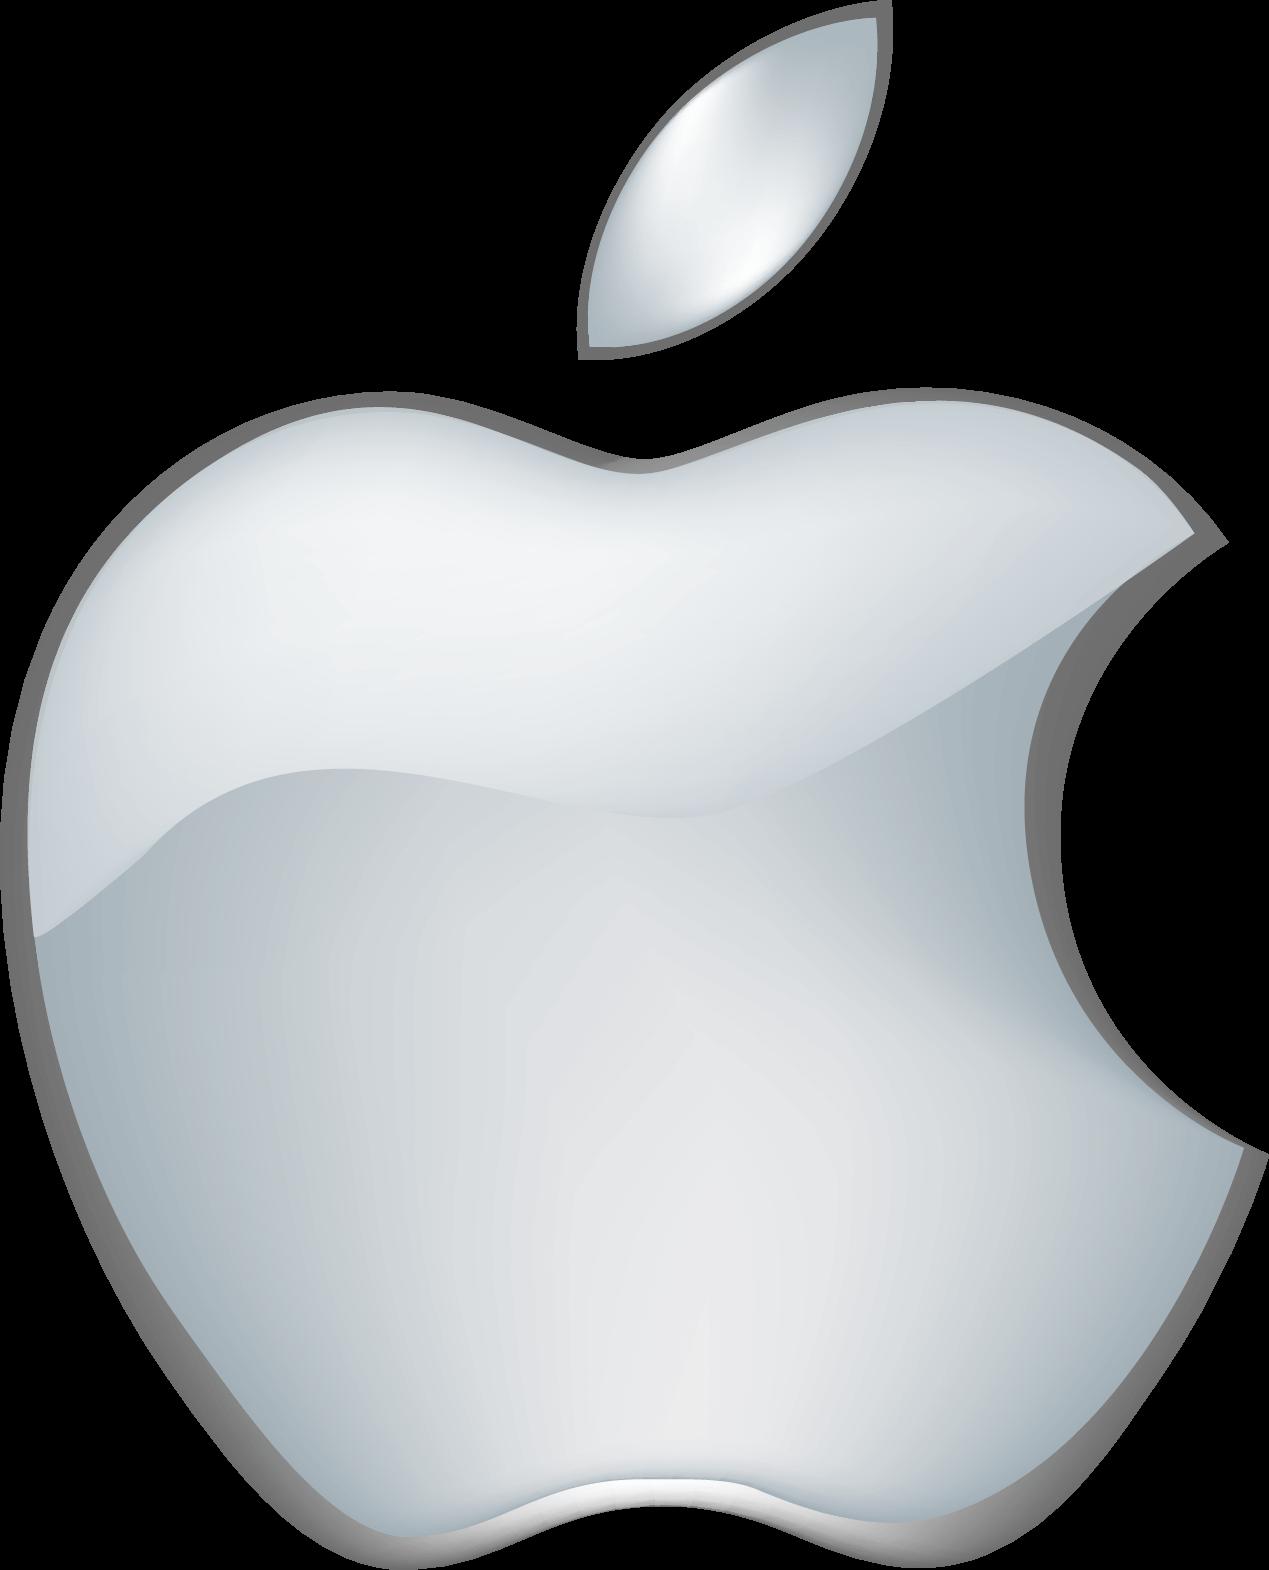 Transparent apple logo clipart - Apple Logo [apple Computer] - Apple Logo 3d Png